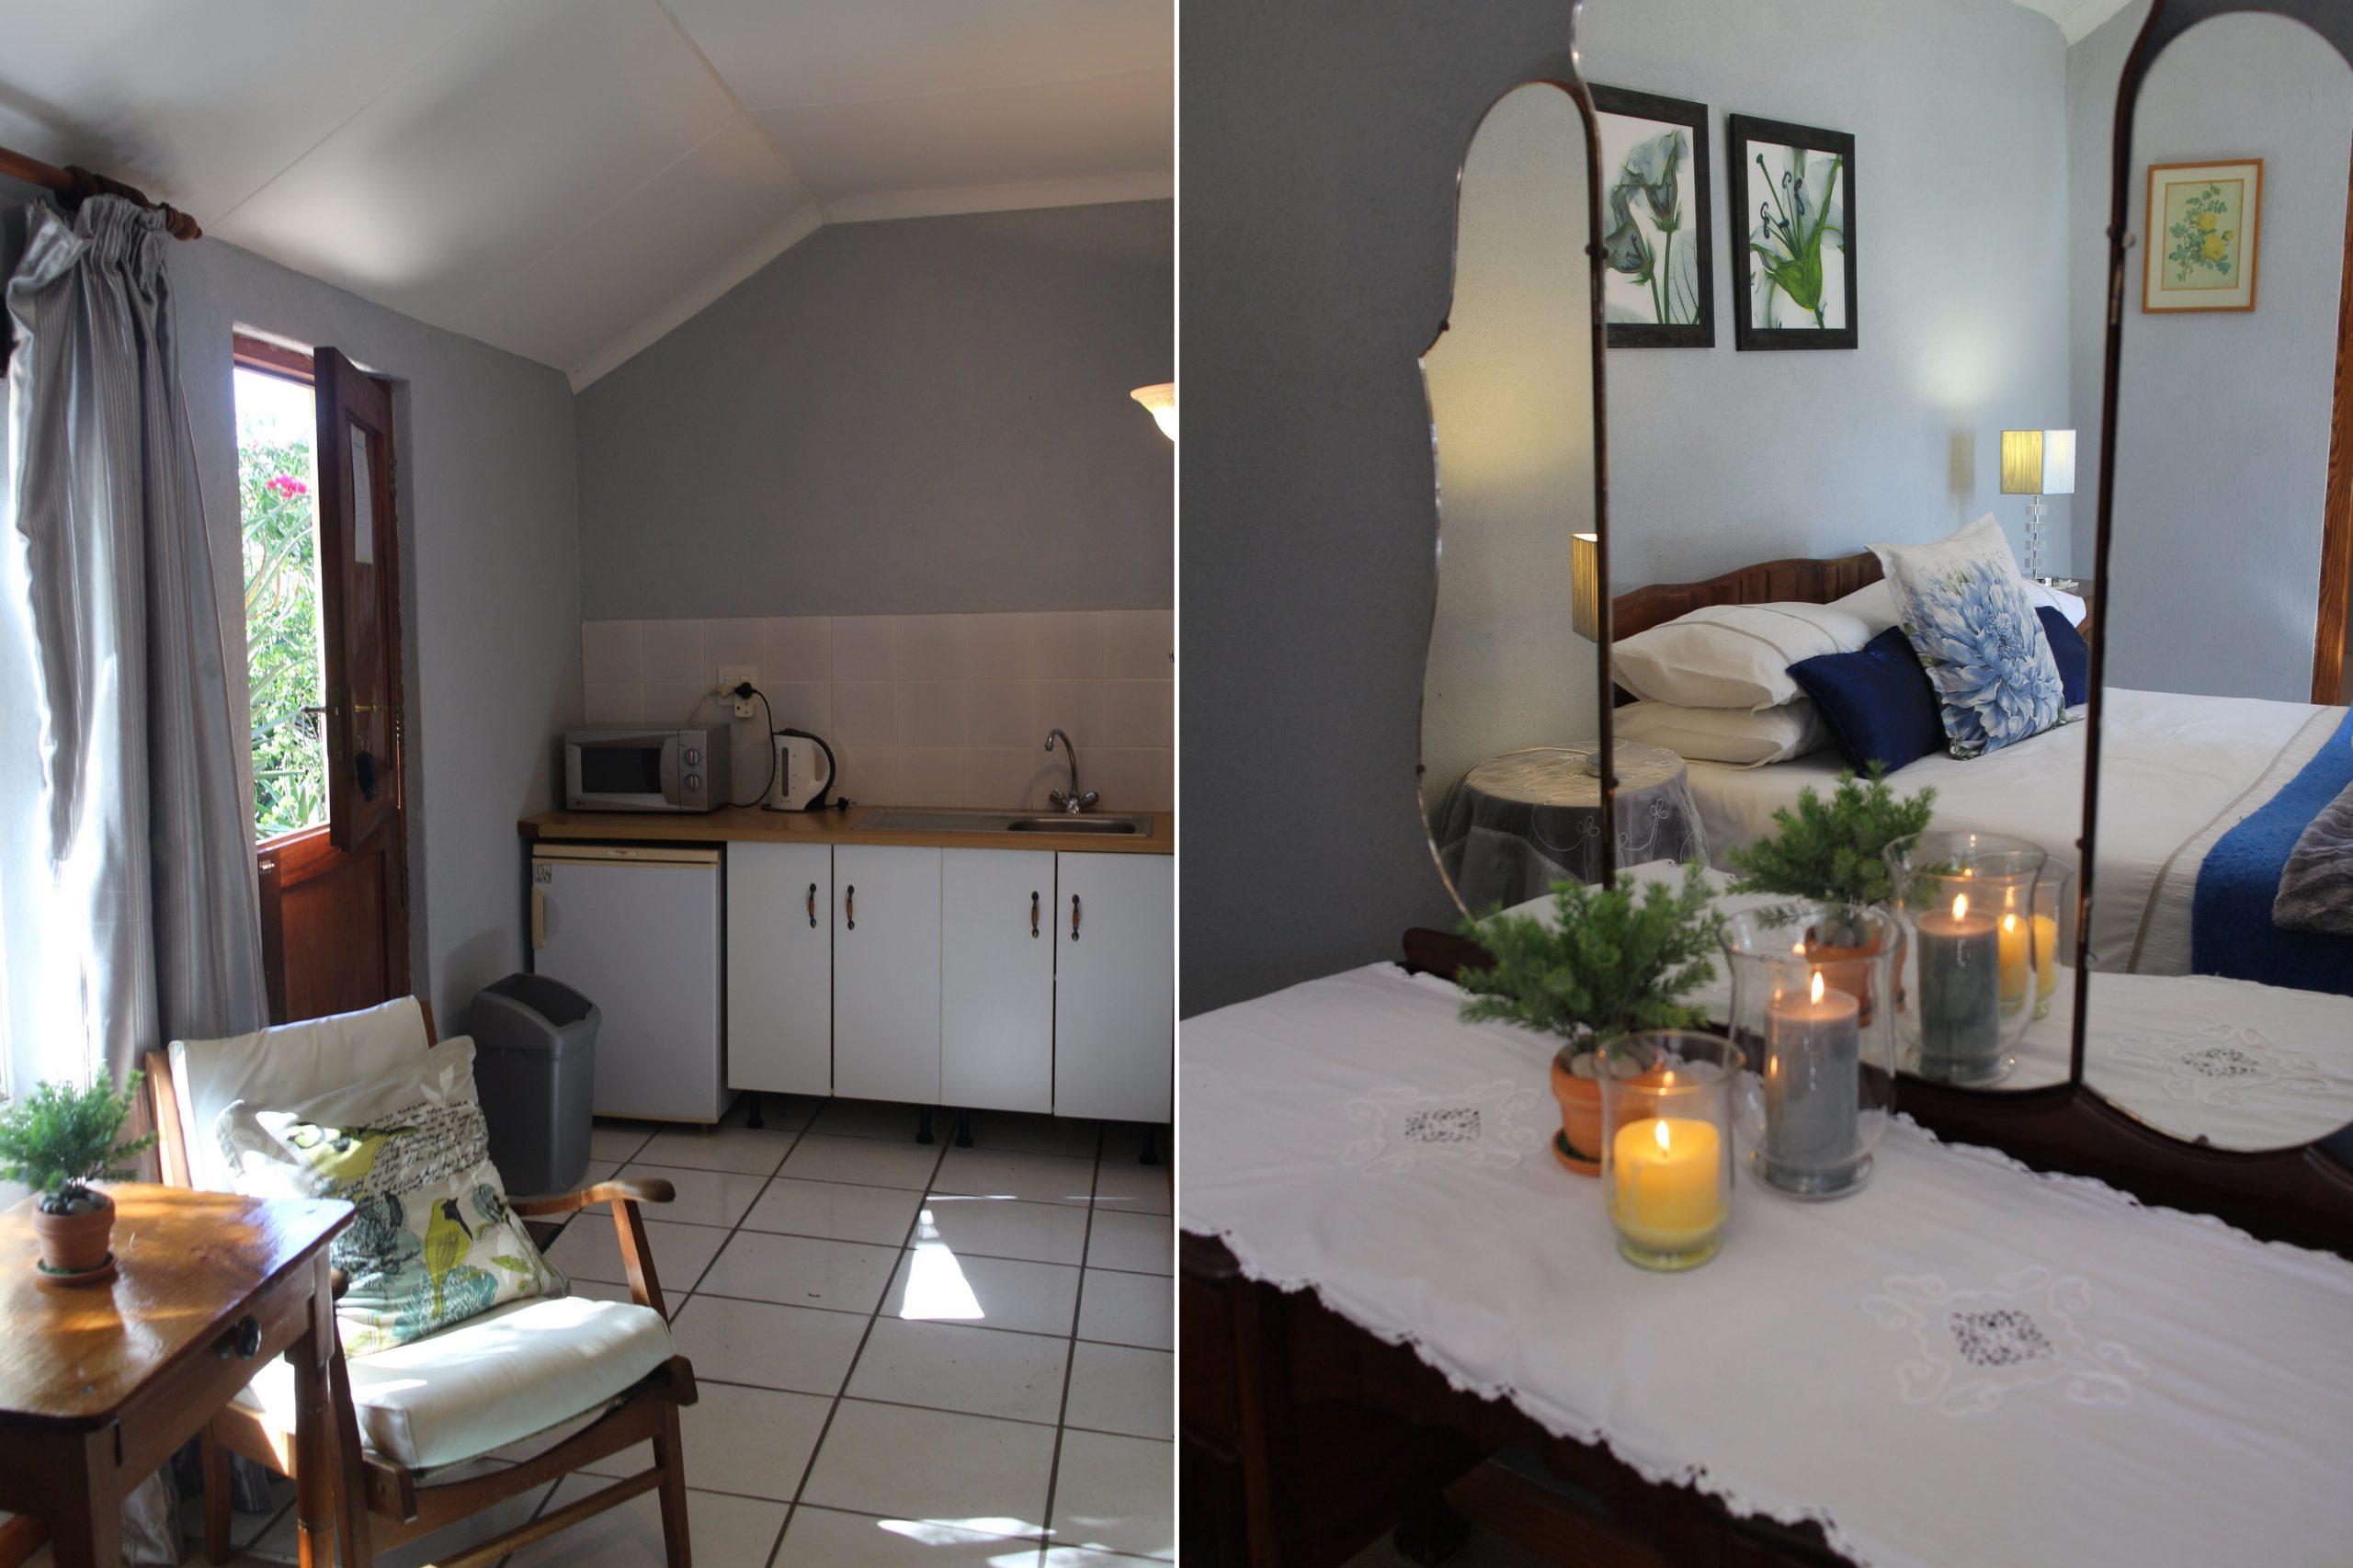 Kuifkopvisvanger - Suikerbekkie Room in Velddrif, Berg River 2